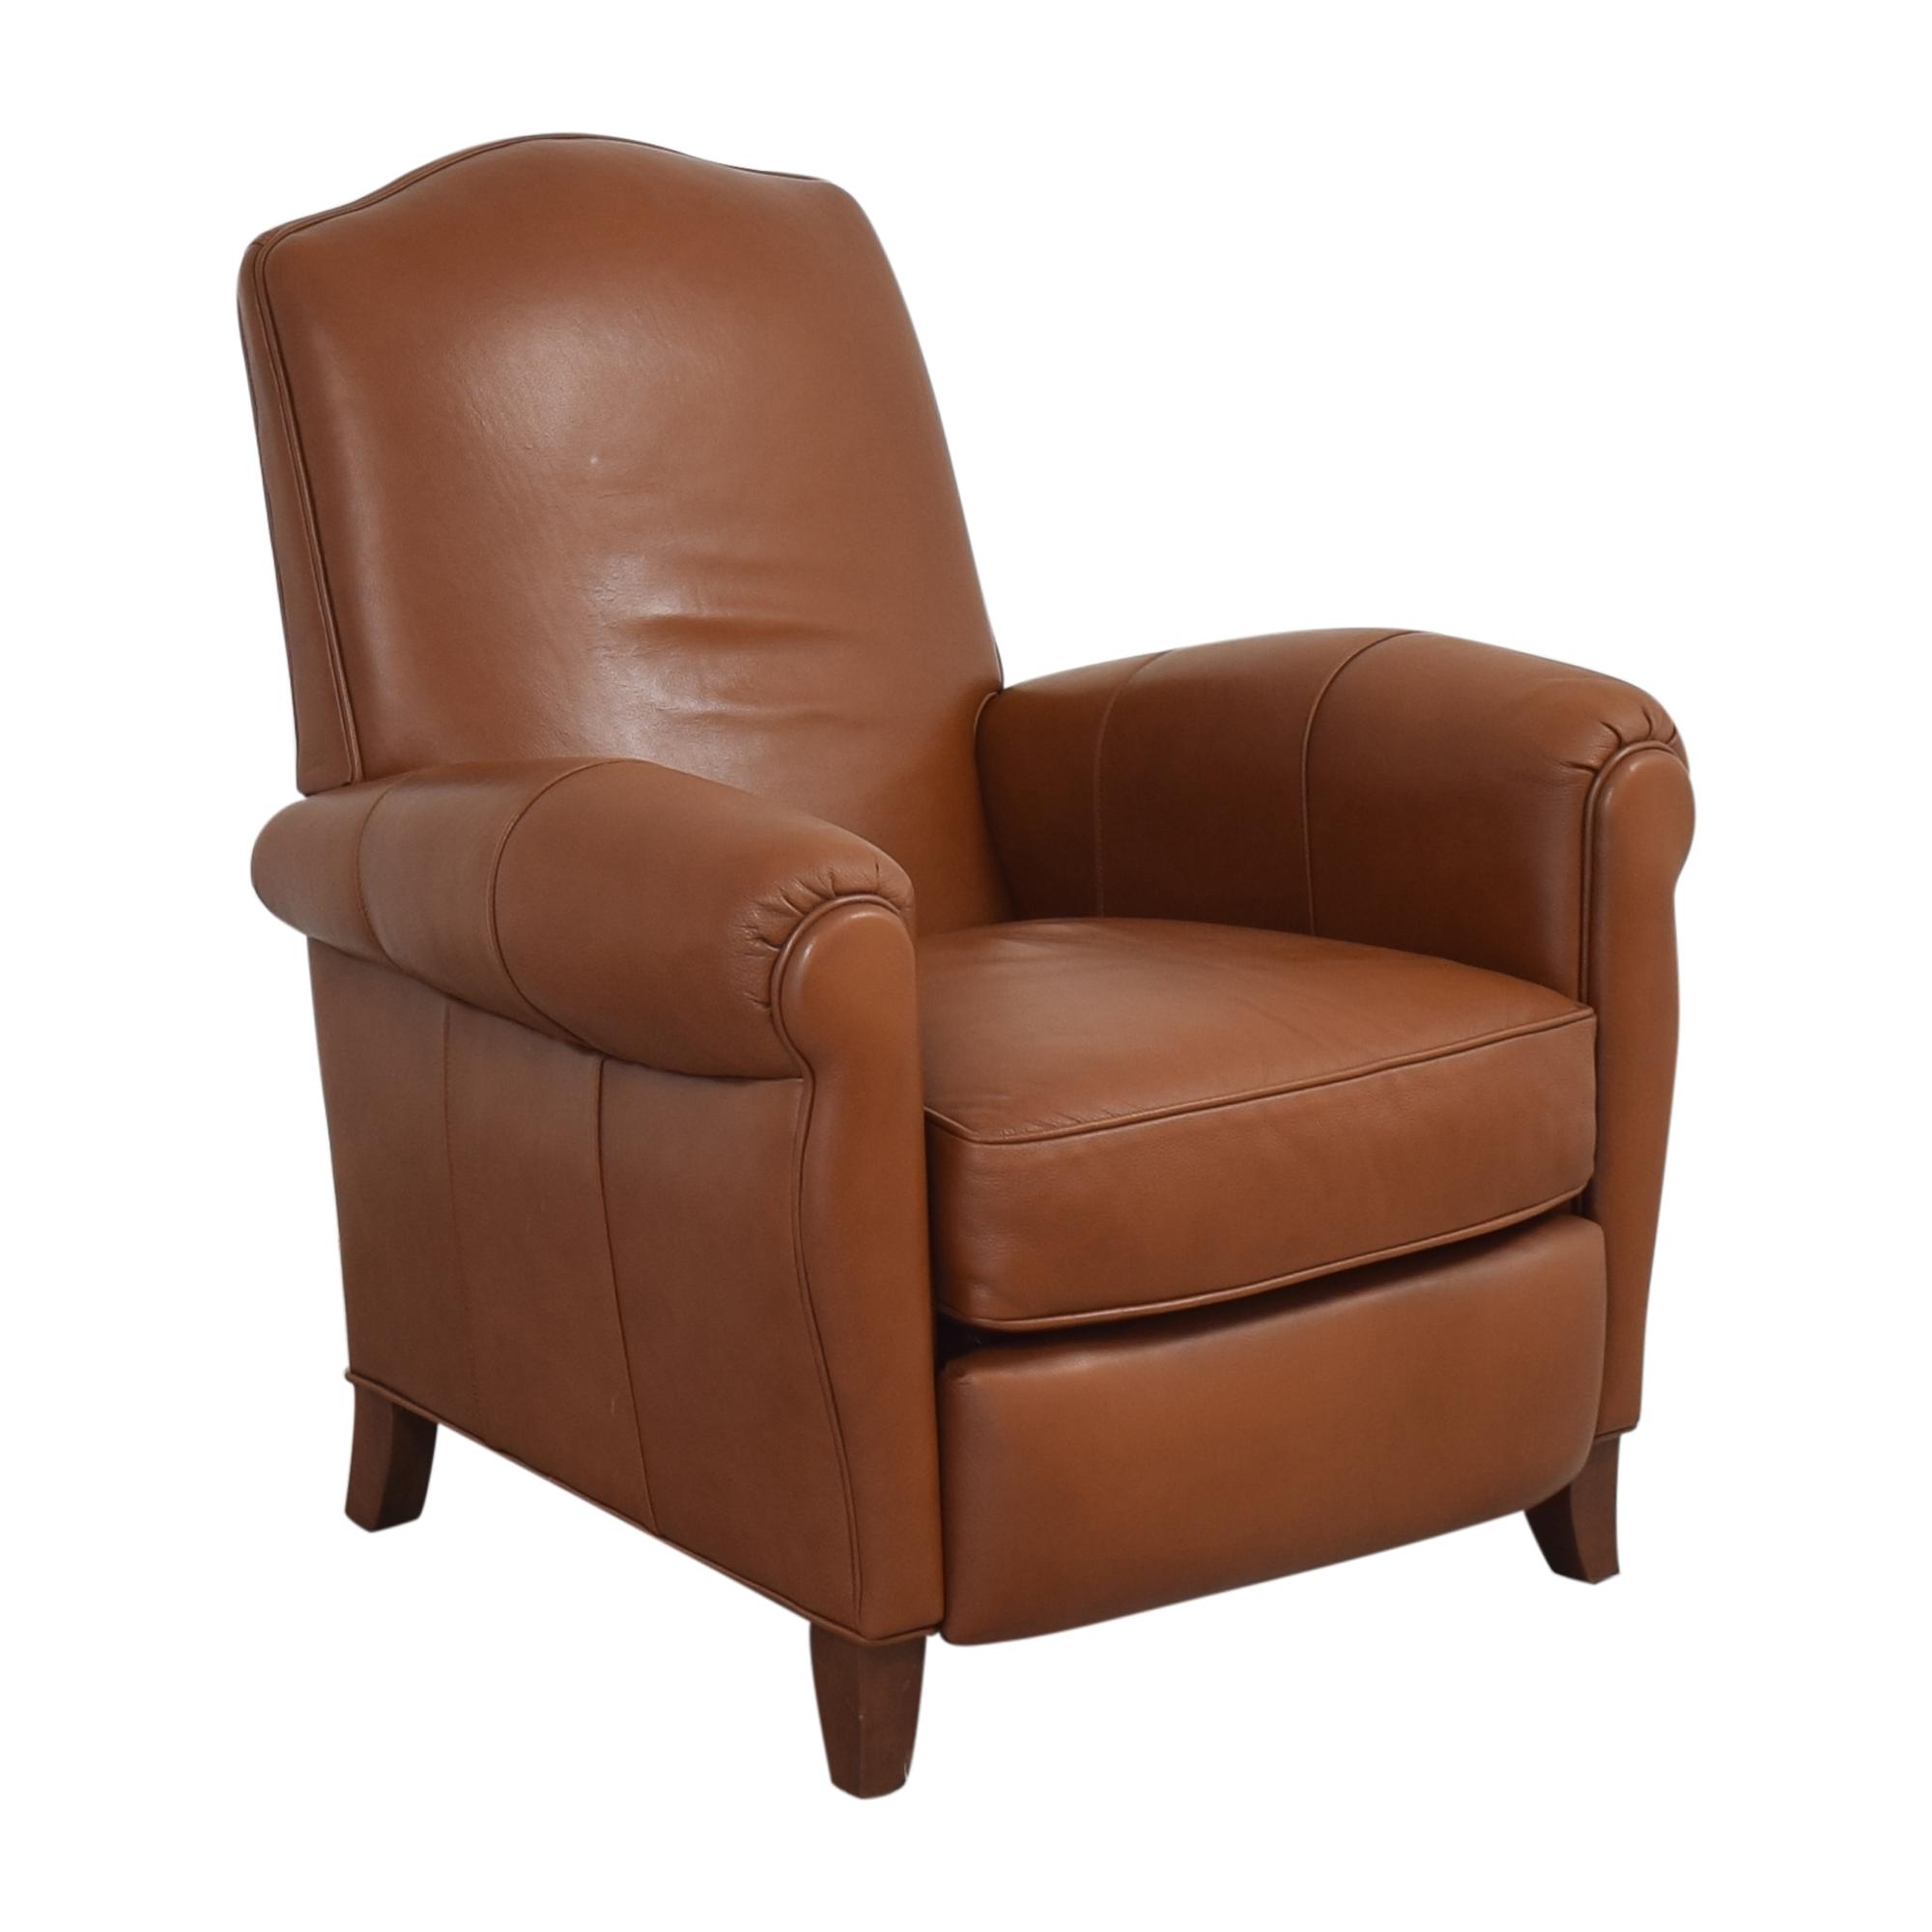 buy Ethan Allen Roll Arm Recliner Ethan Allen Chairs